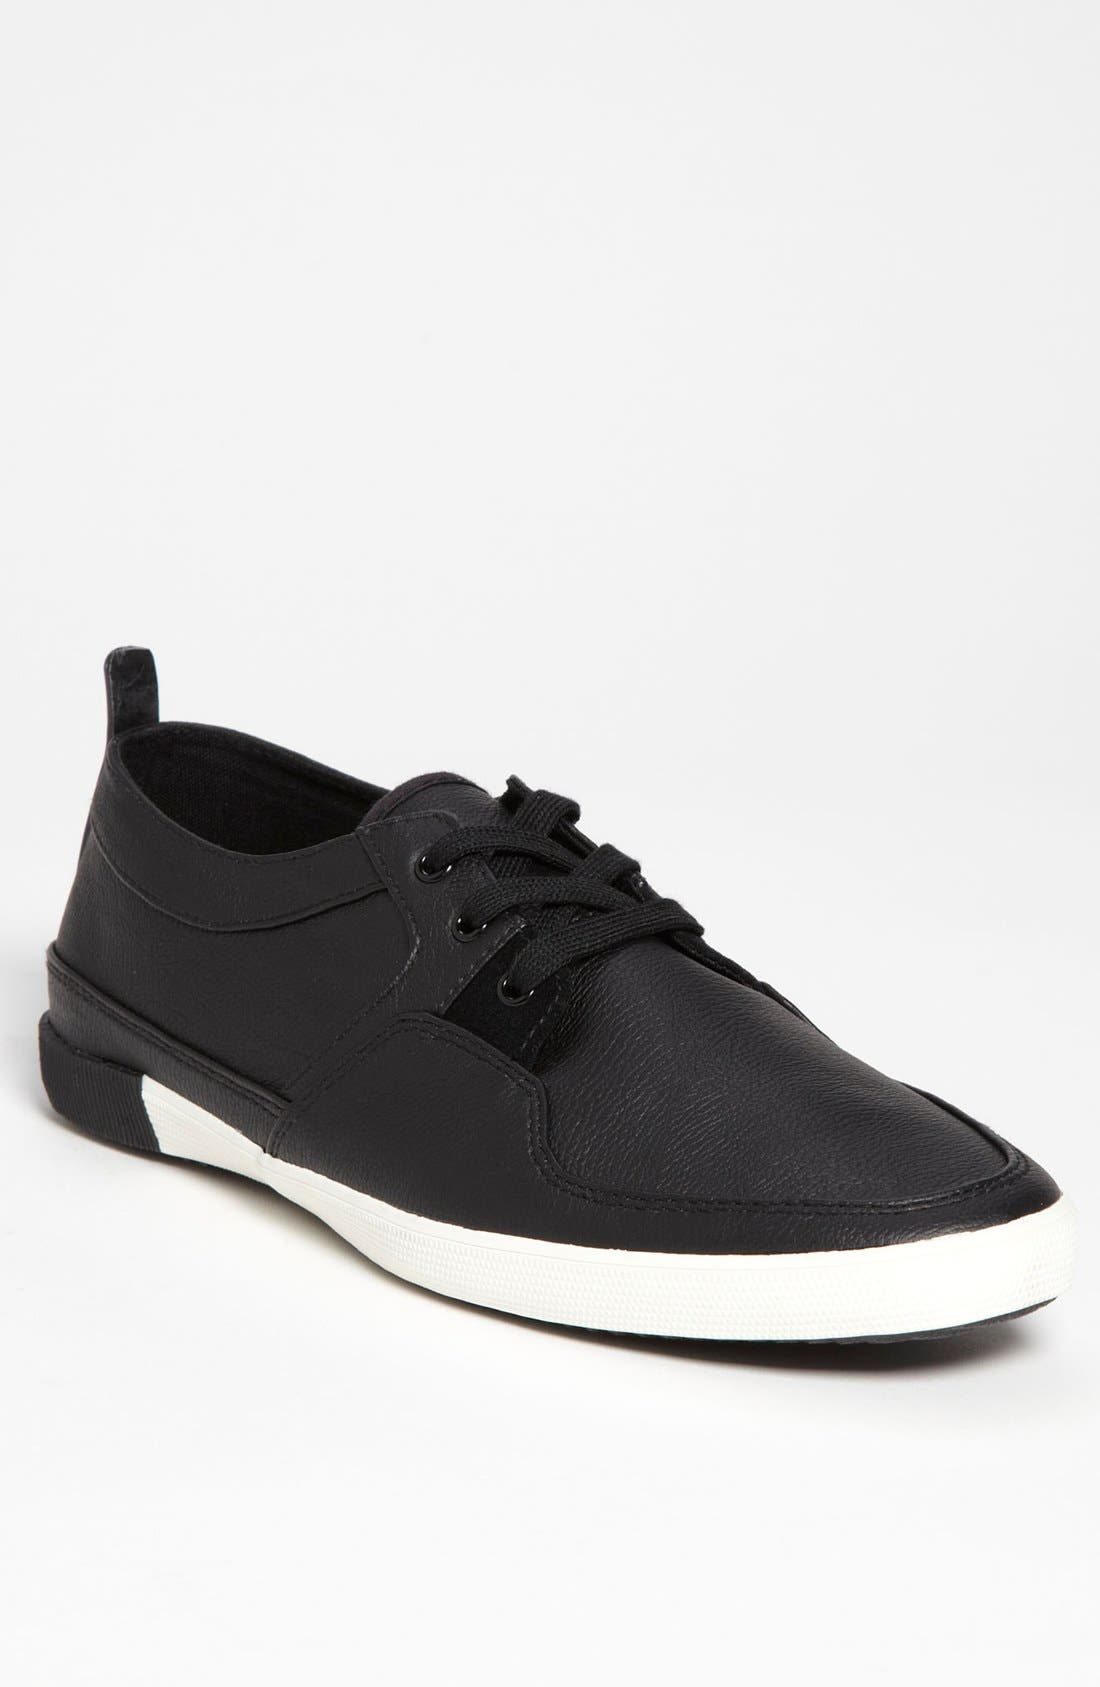 Main Image - ALDO 'Brunderman' Sneaker